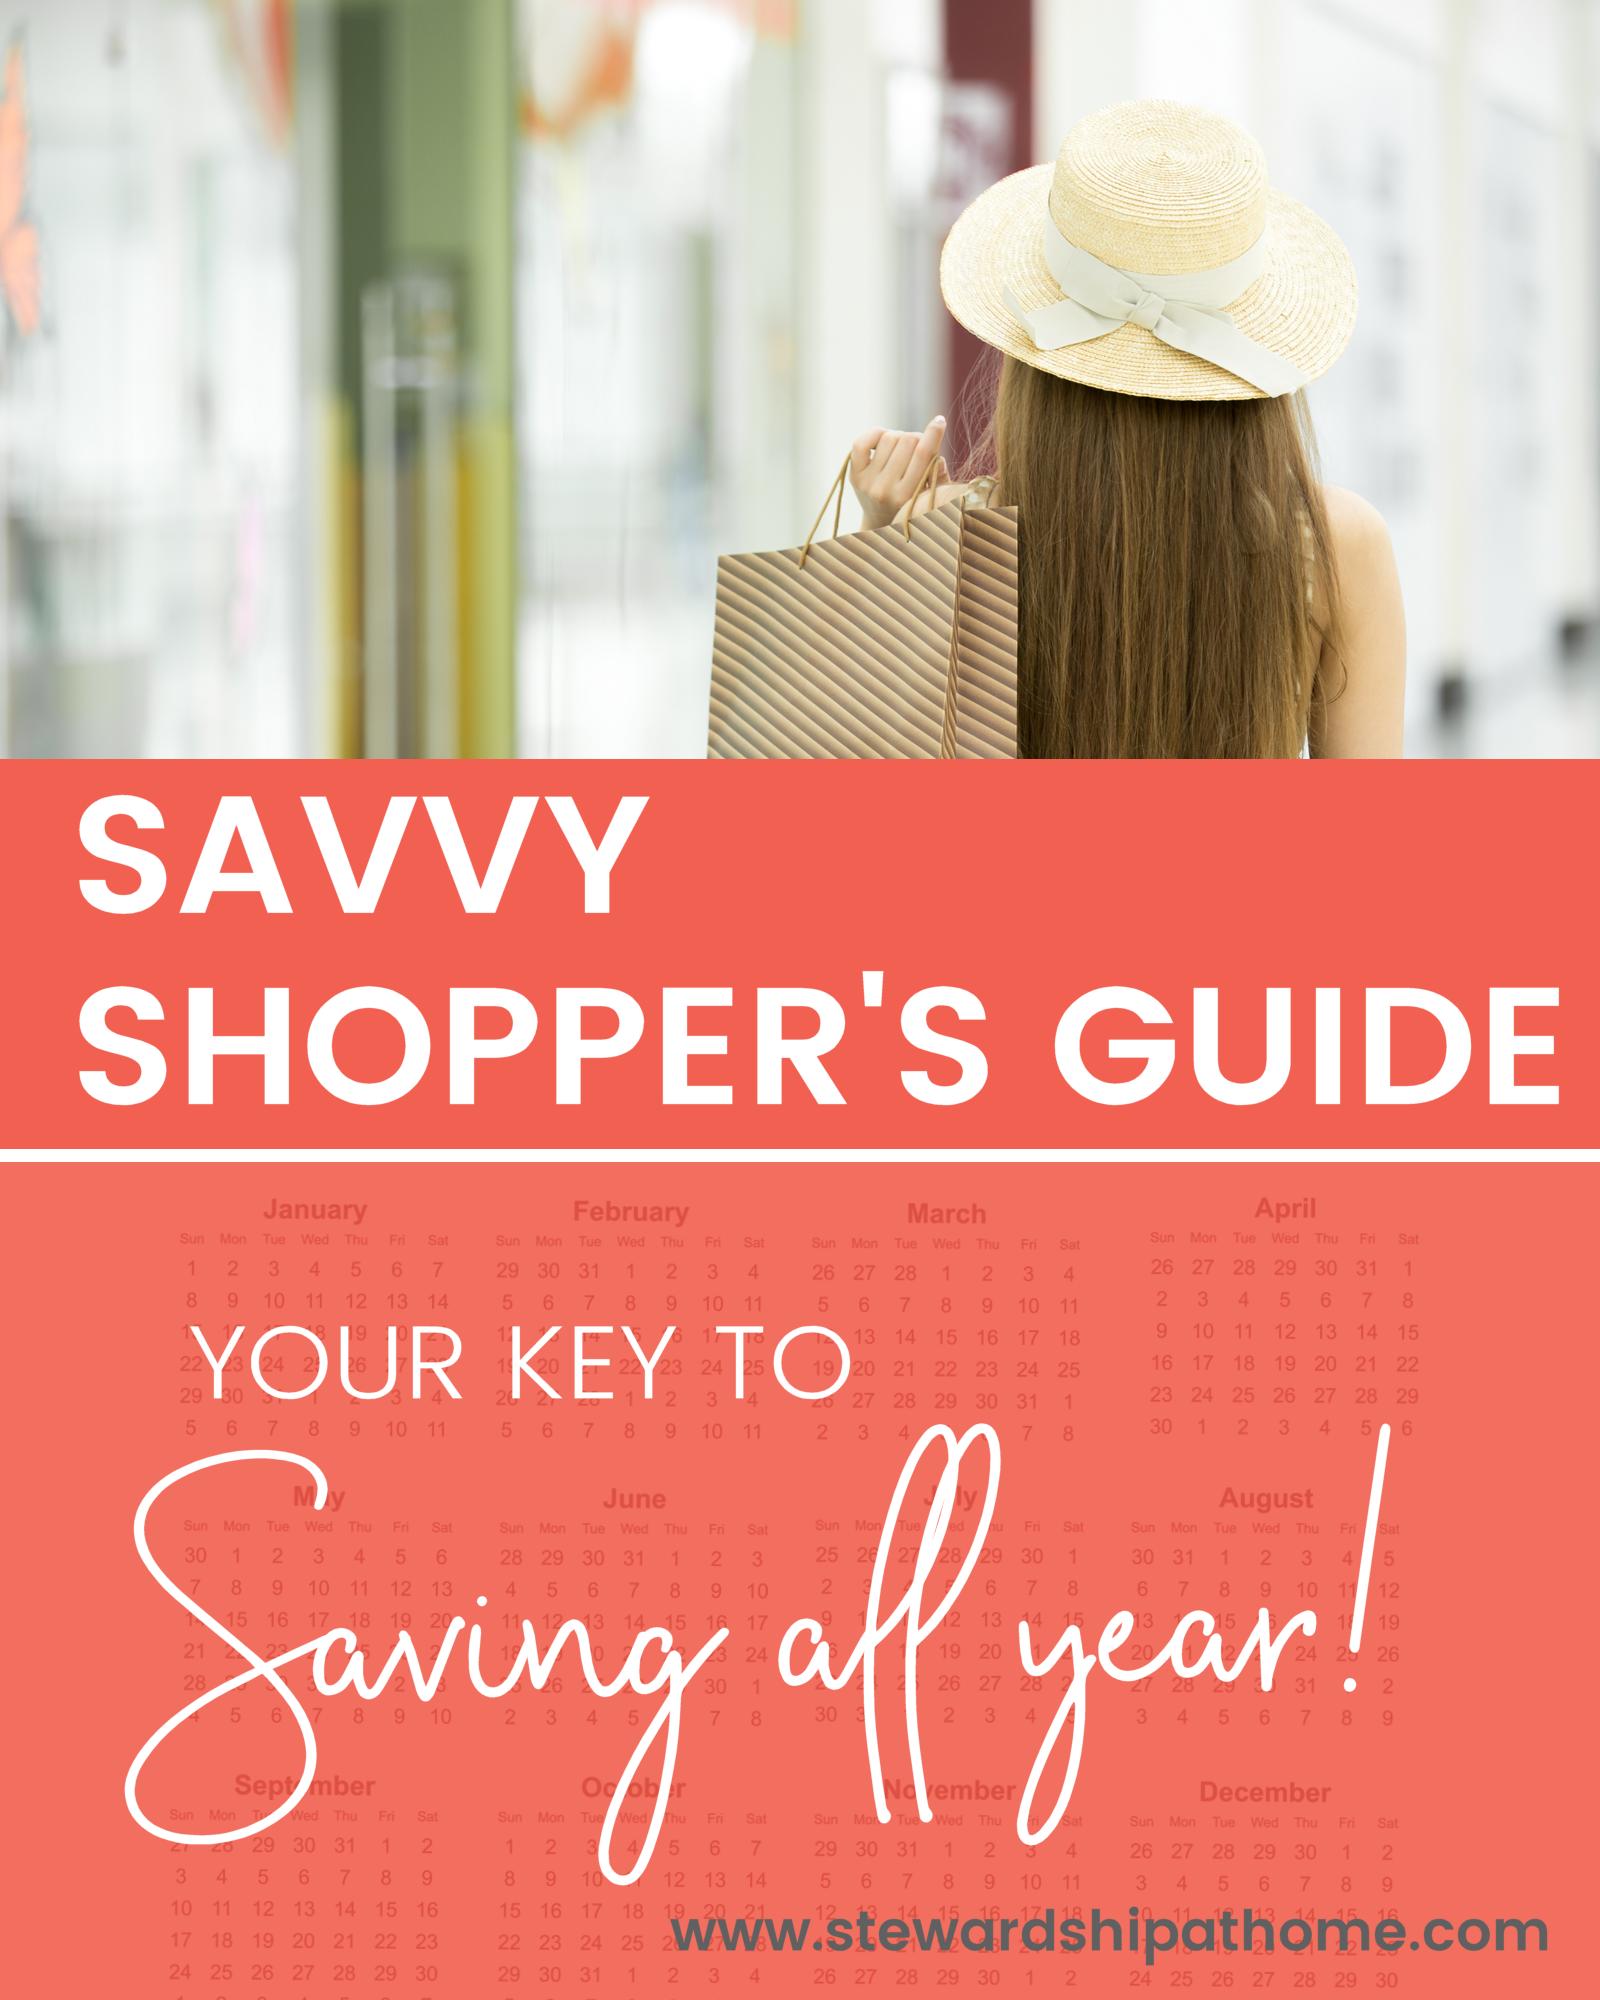 Savvy Shopper's Guide